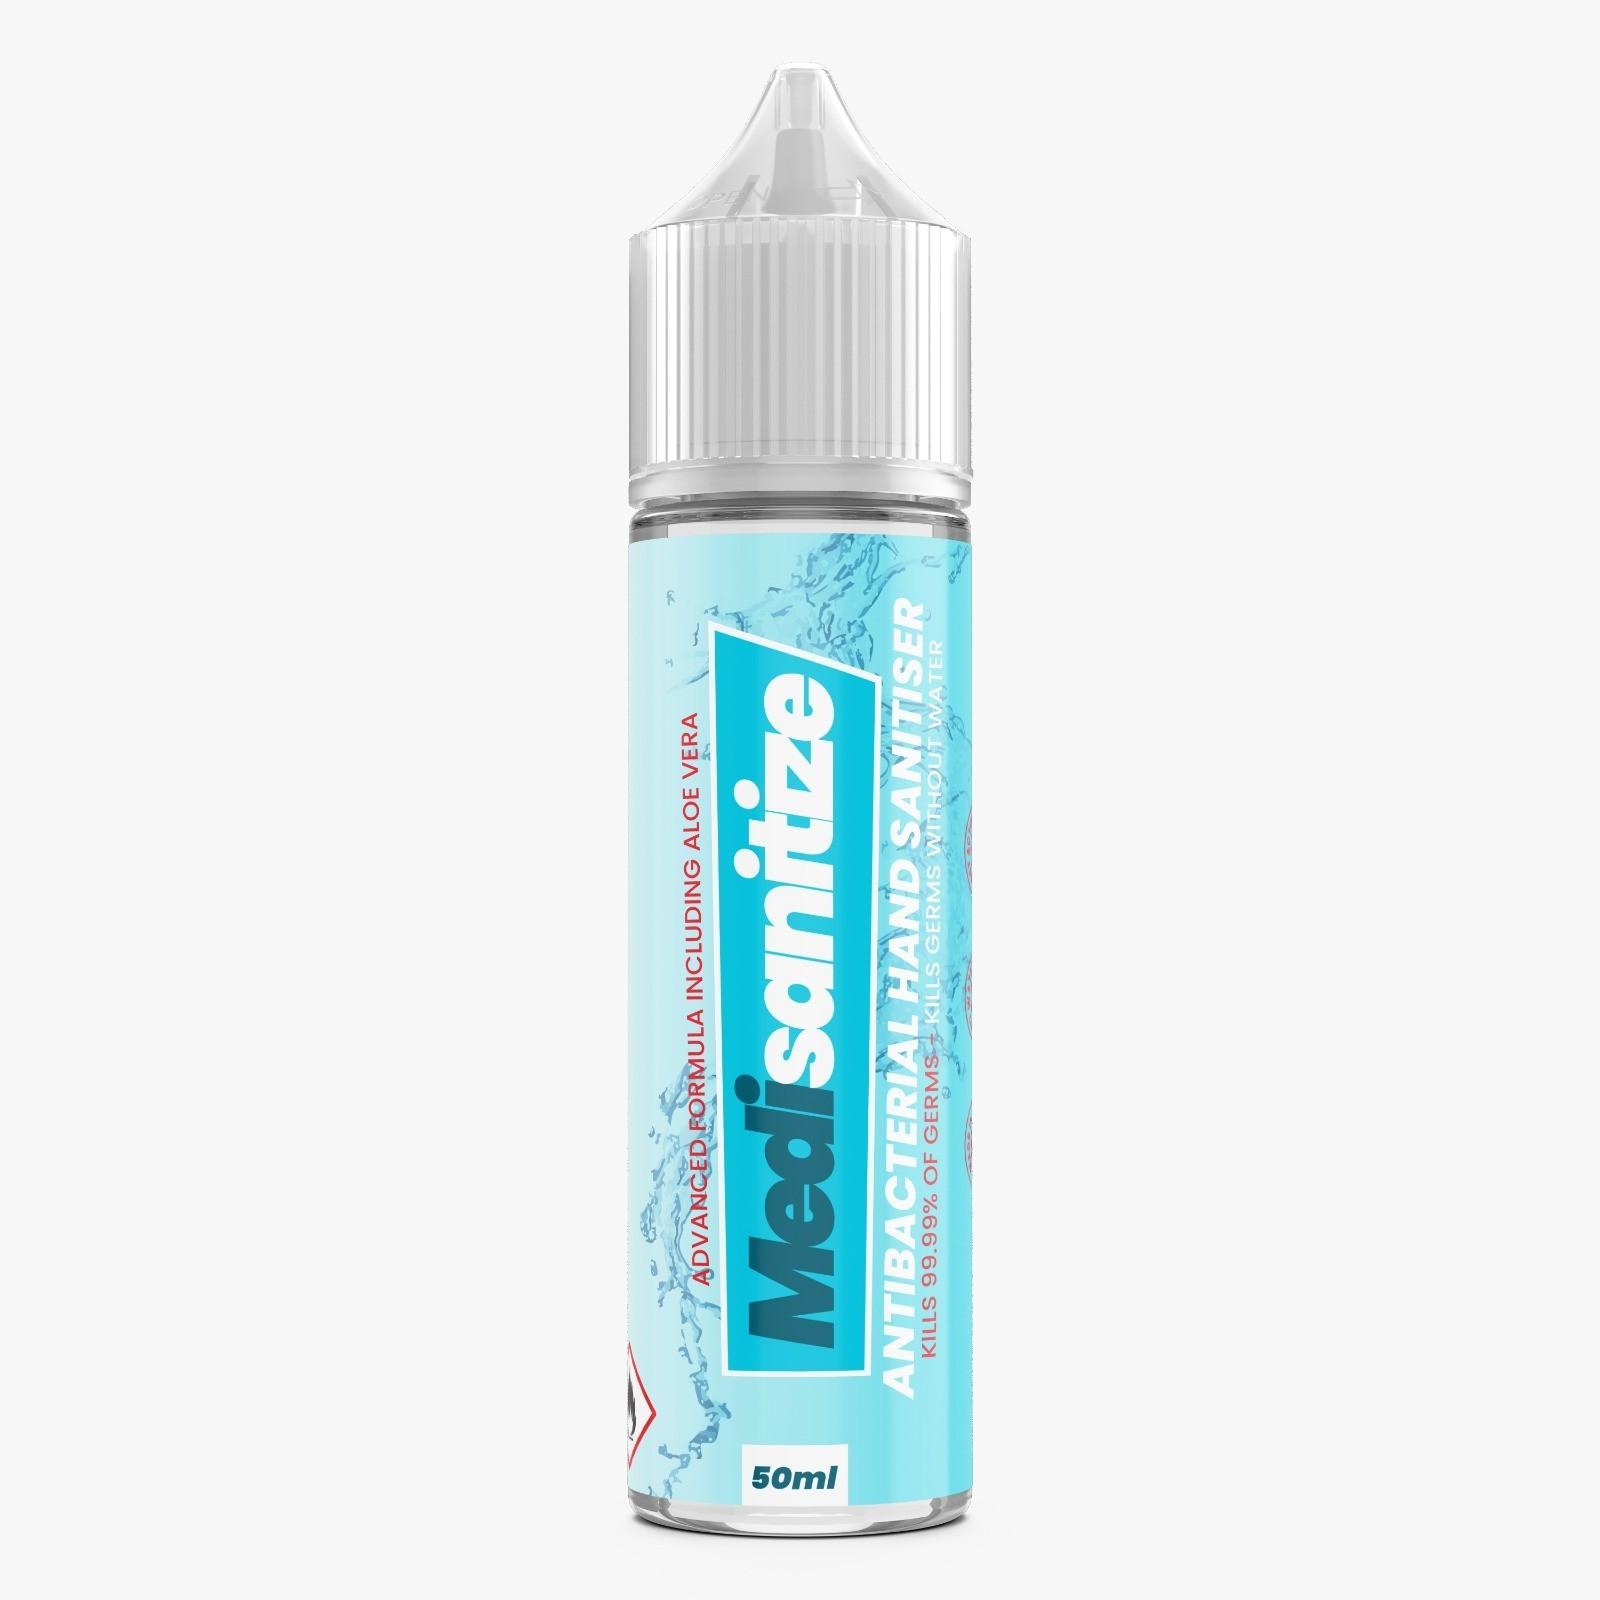 Portable 75% Alcohol Antibacterial Hand Sanitizer